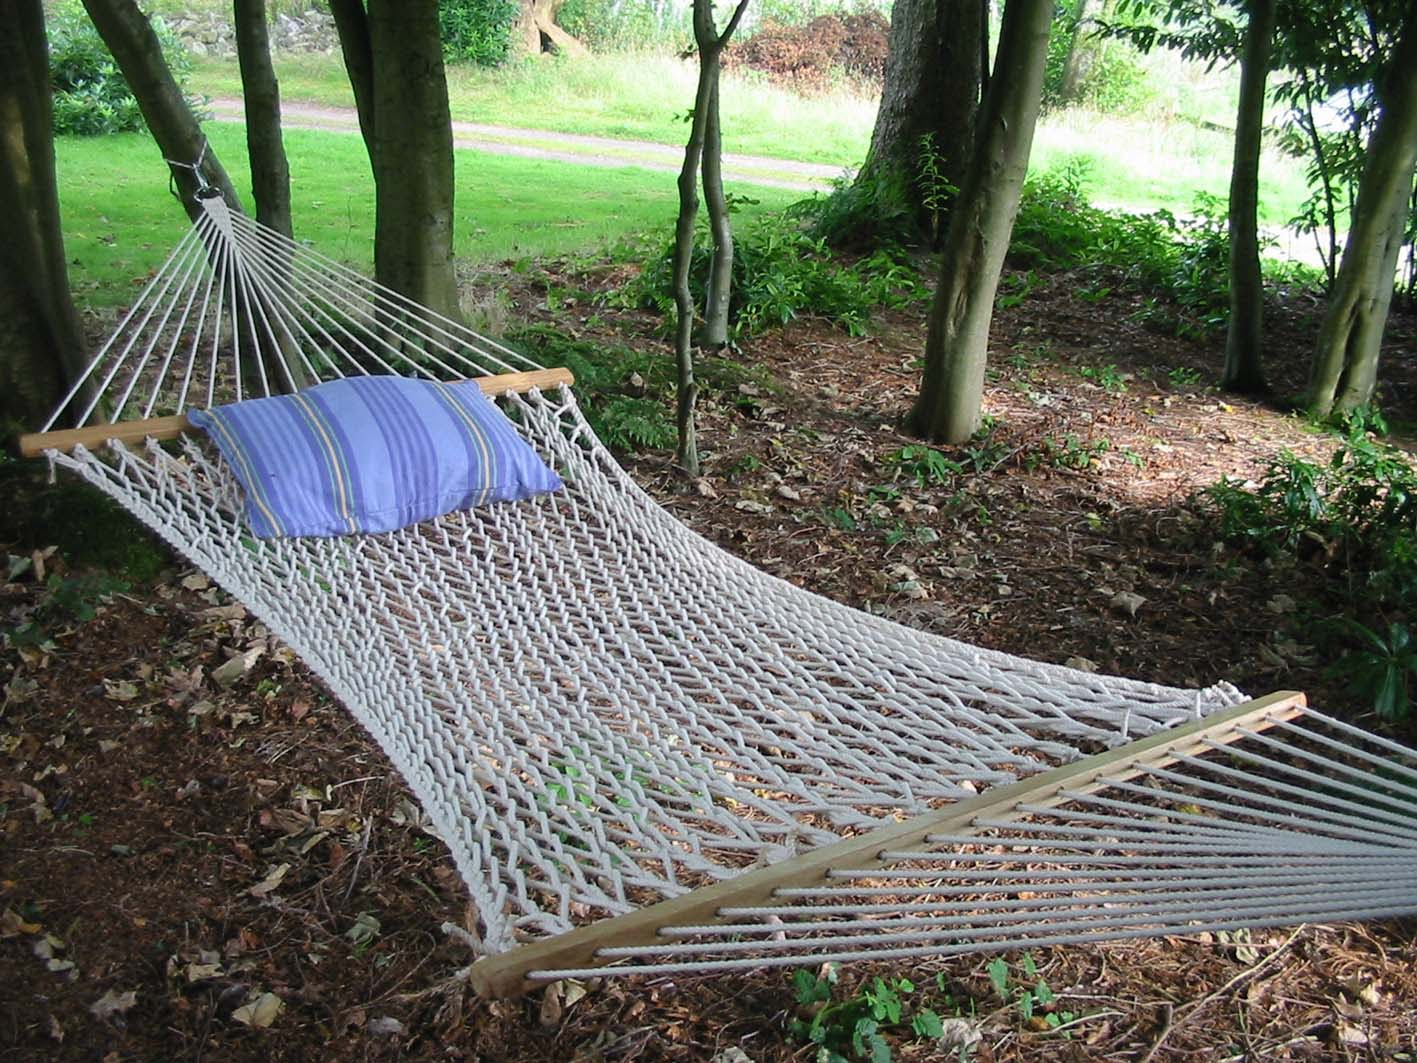 patio hammock natural garden indoor off or chair hammocks all rope handmade porch white amazon com swing dp outdoor hanging